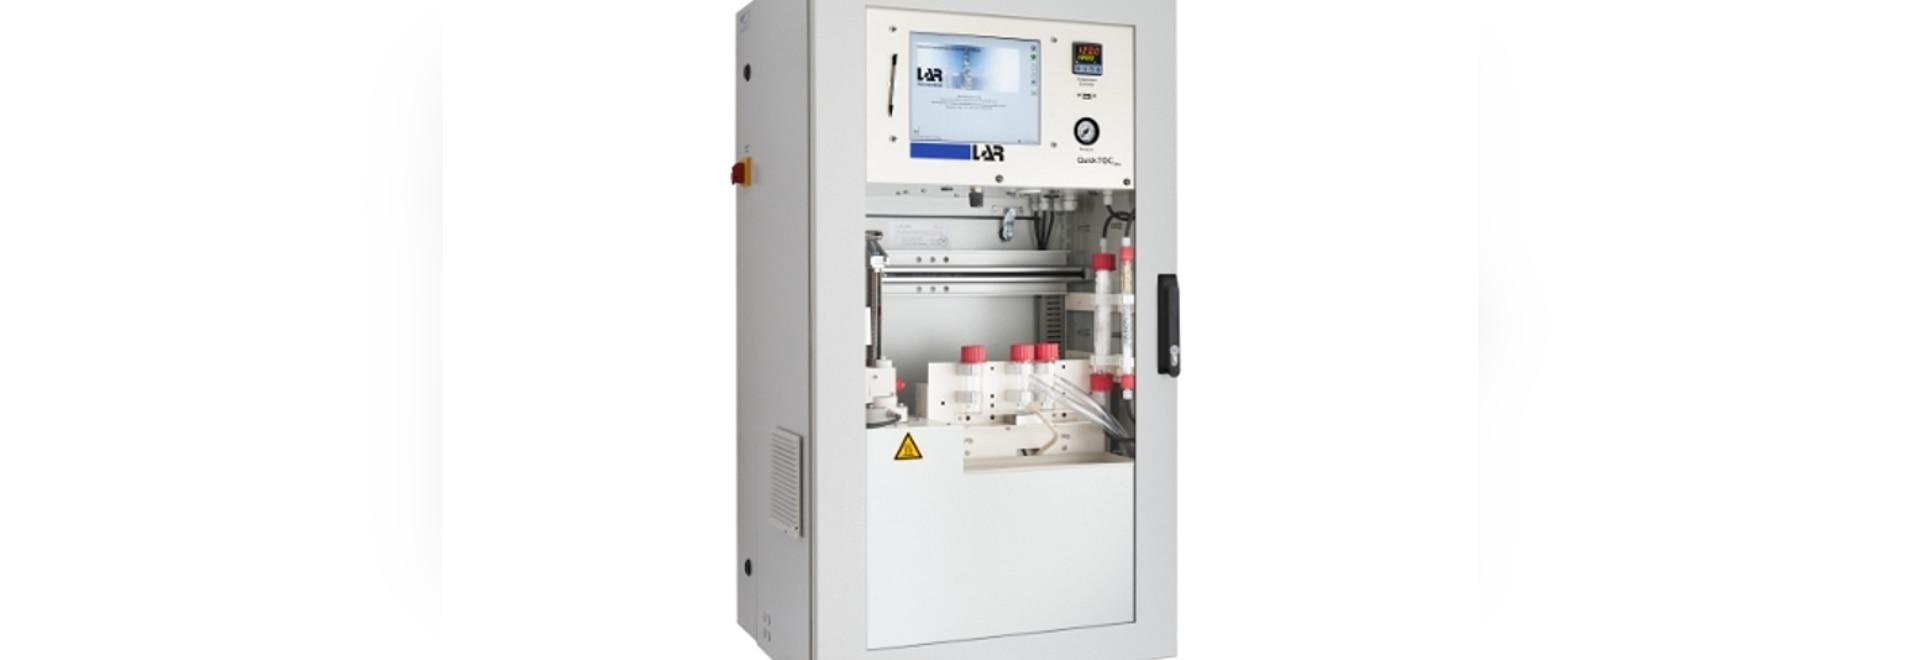 TOC process analyzer QuickTOCultra